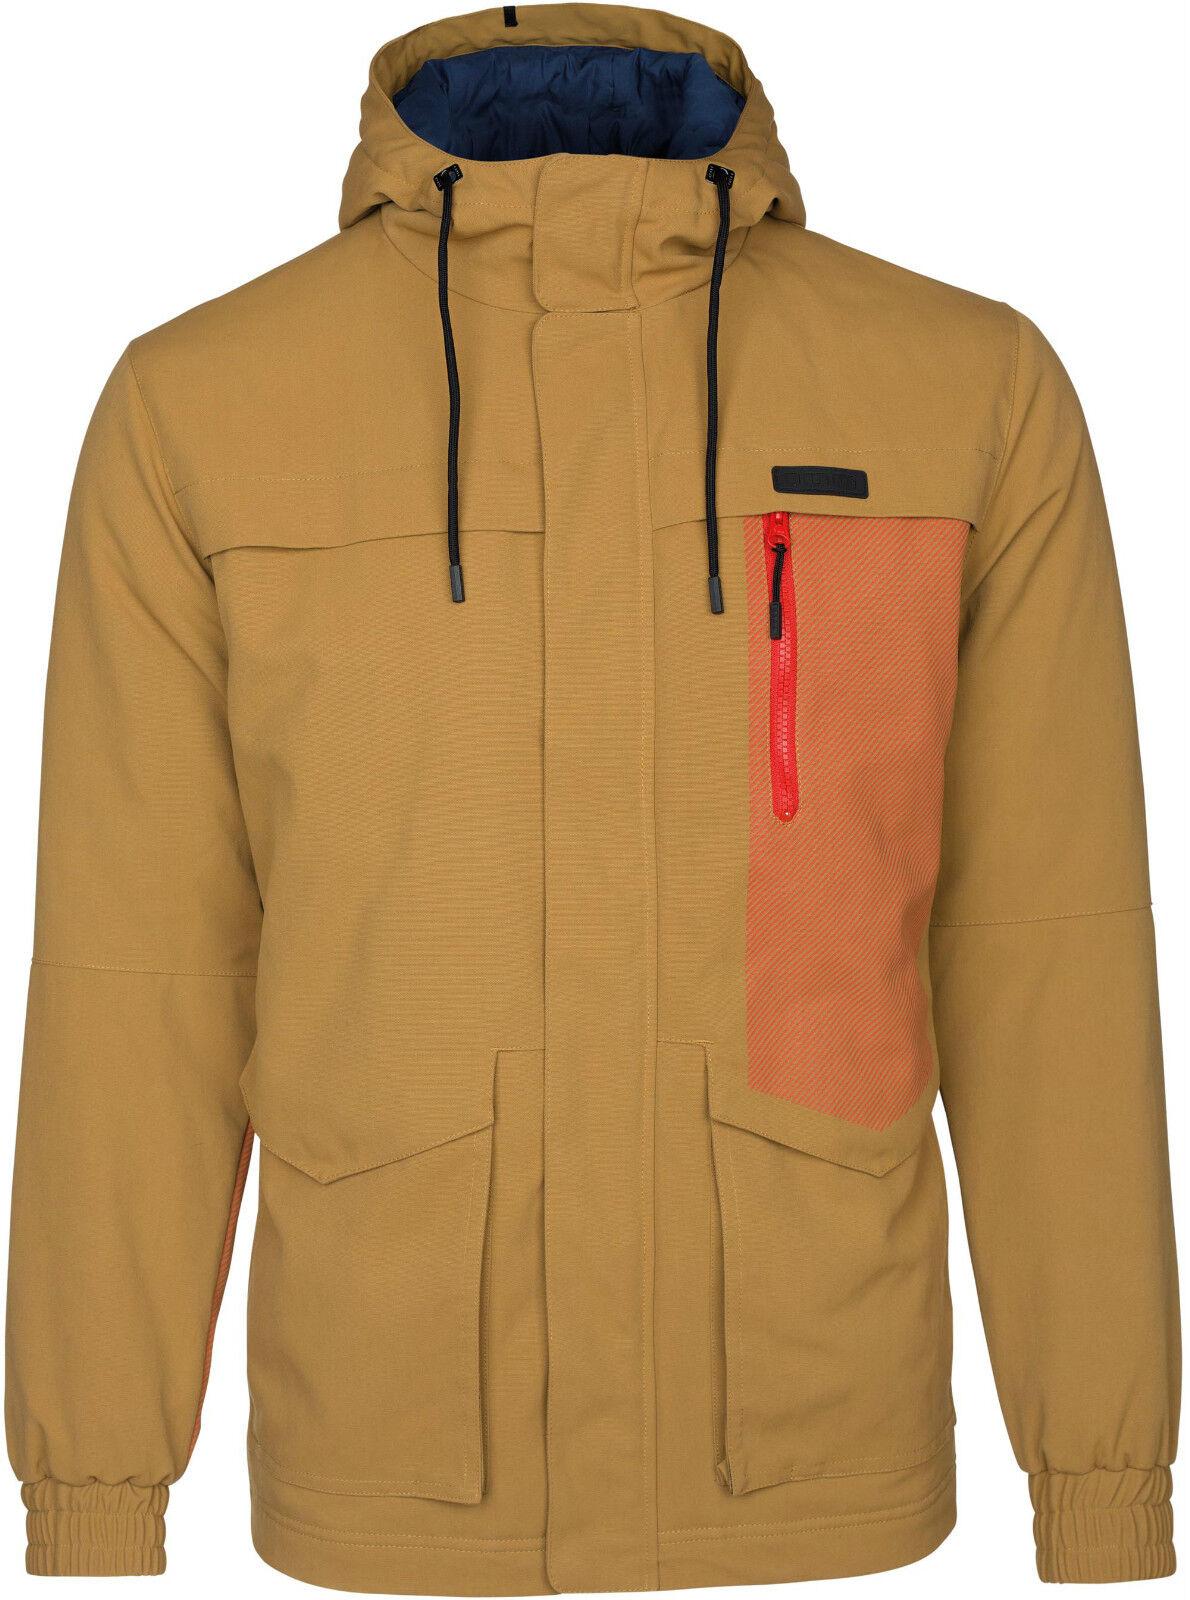 Ion chaqueta  Storm  resistente al agua, viento denso, transpirable